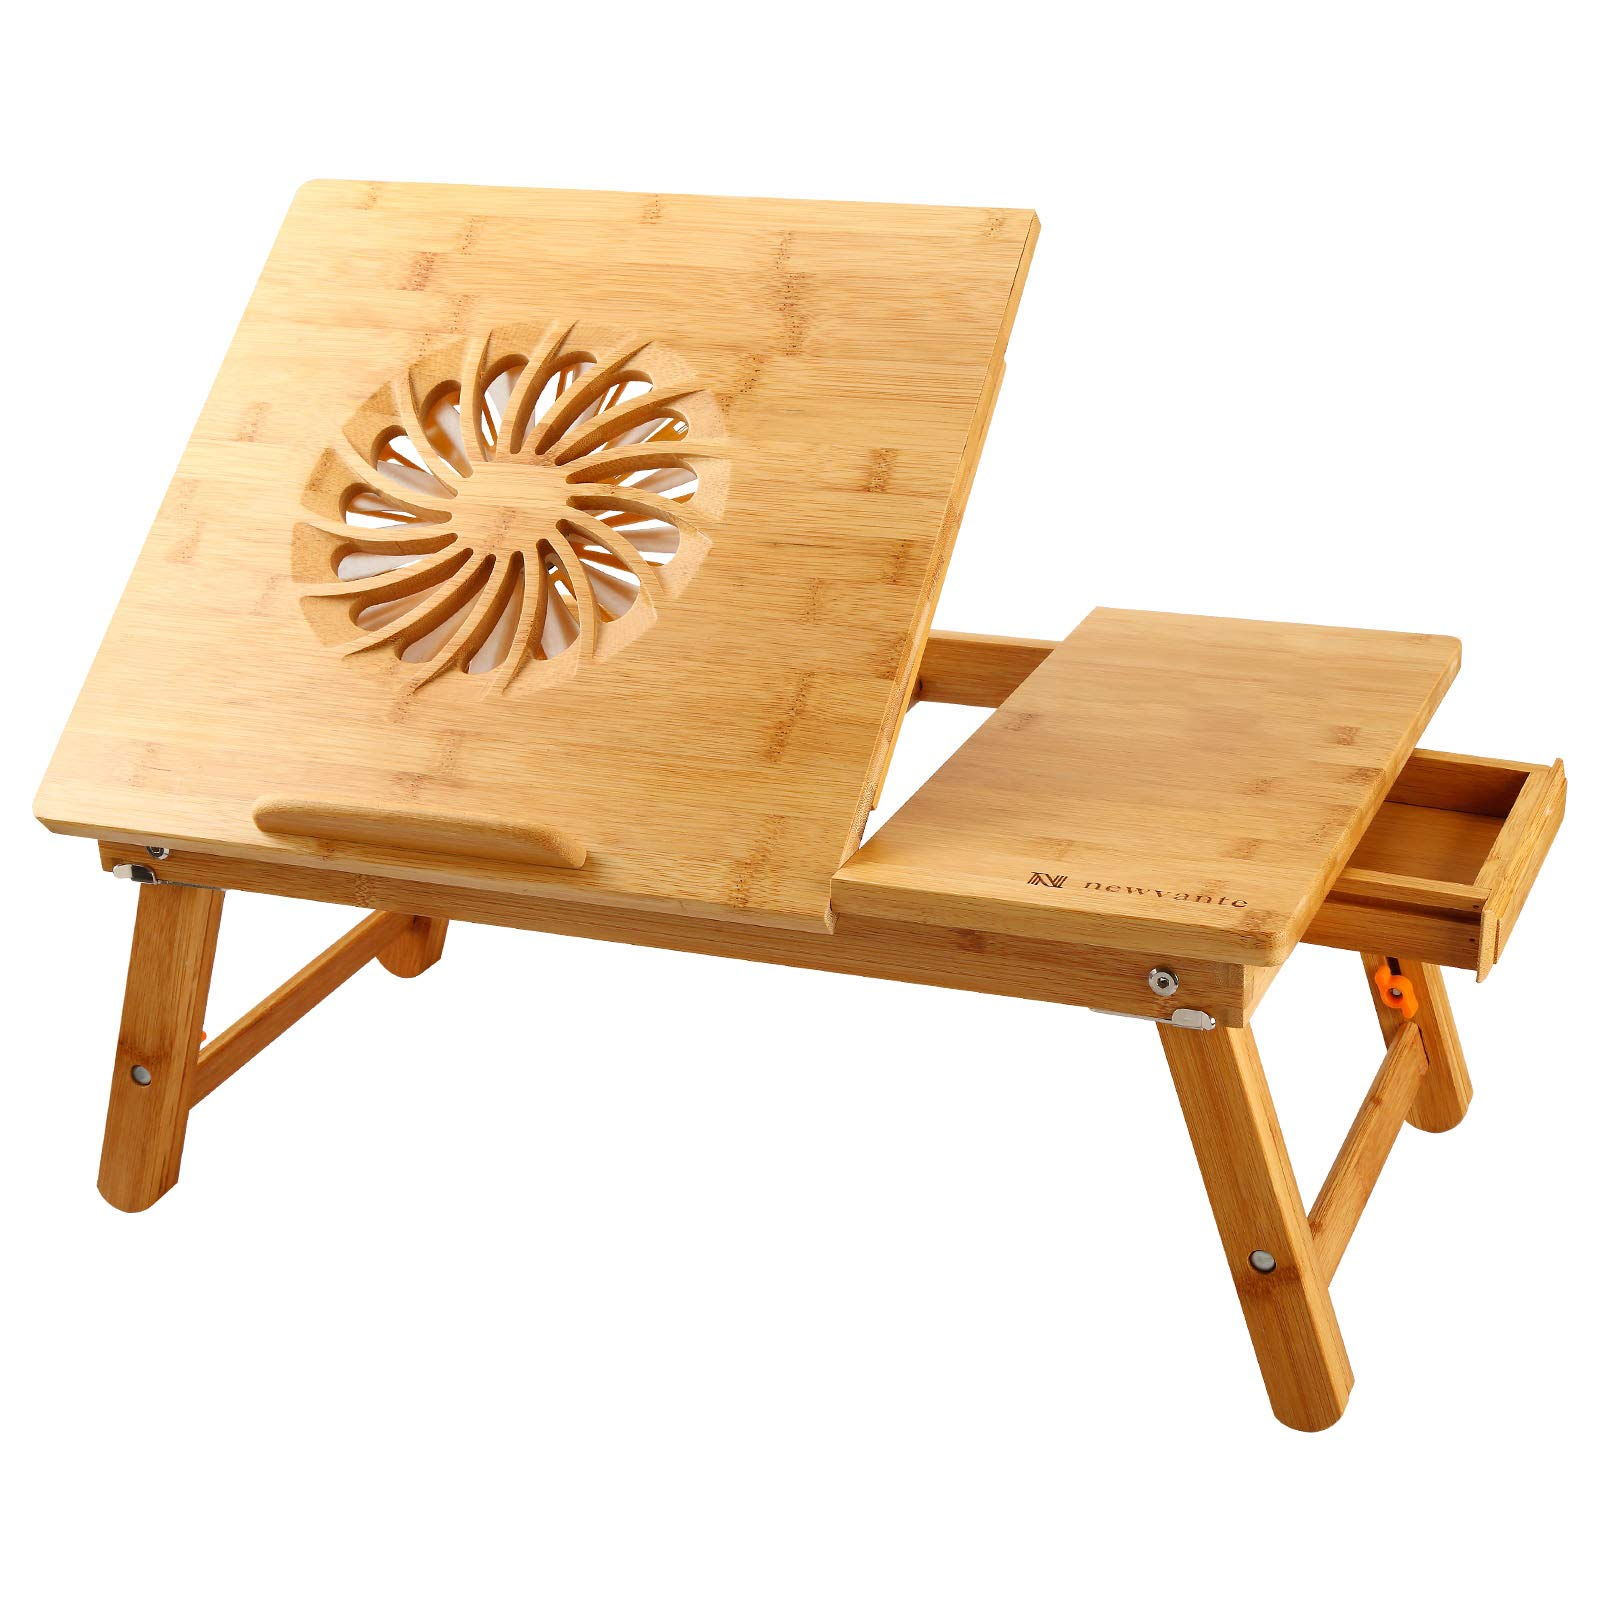 Laptop Desk Nnewvante Adjustable Laptop Desk Table 100% Bamboo with USB Fan Foldable Breakfast Serving Bed Tray w' Drawer by NNEWVANTE